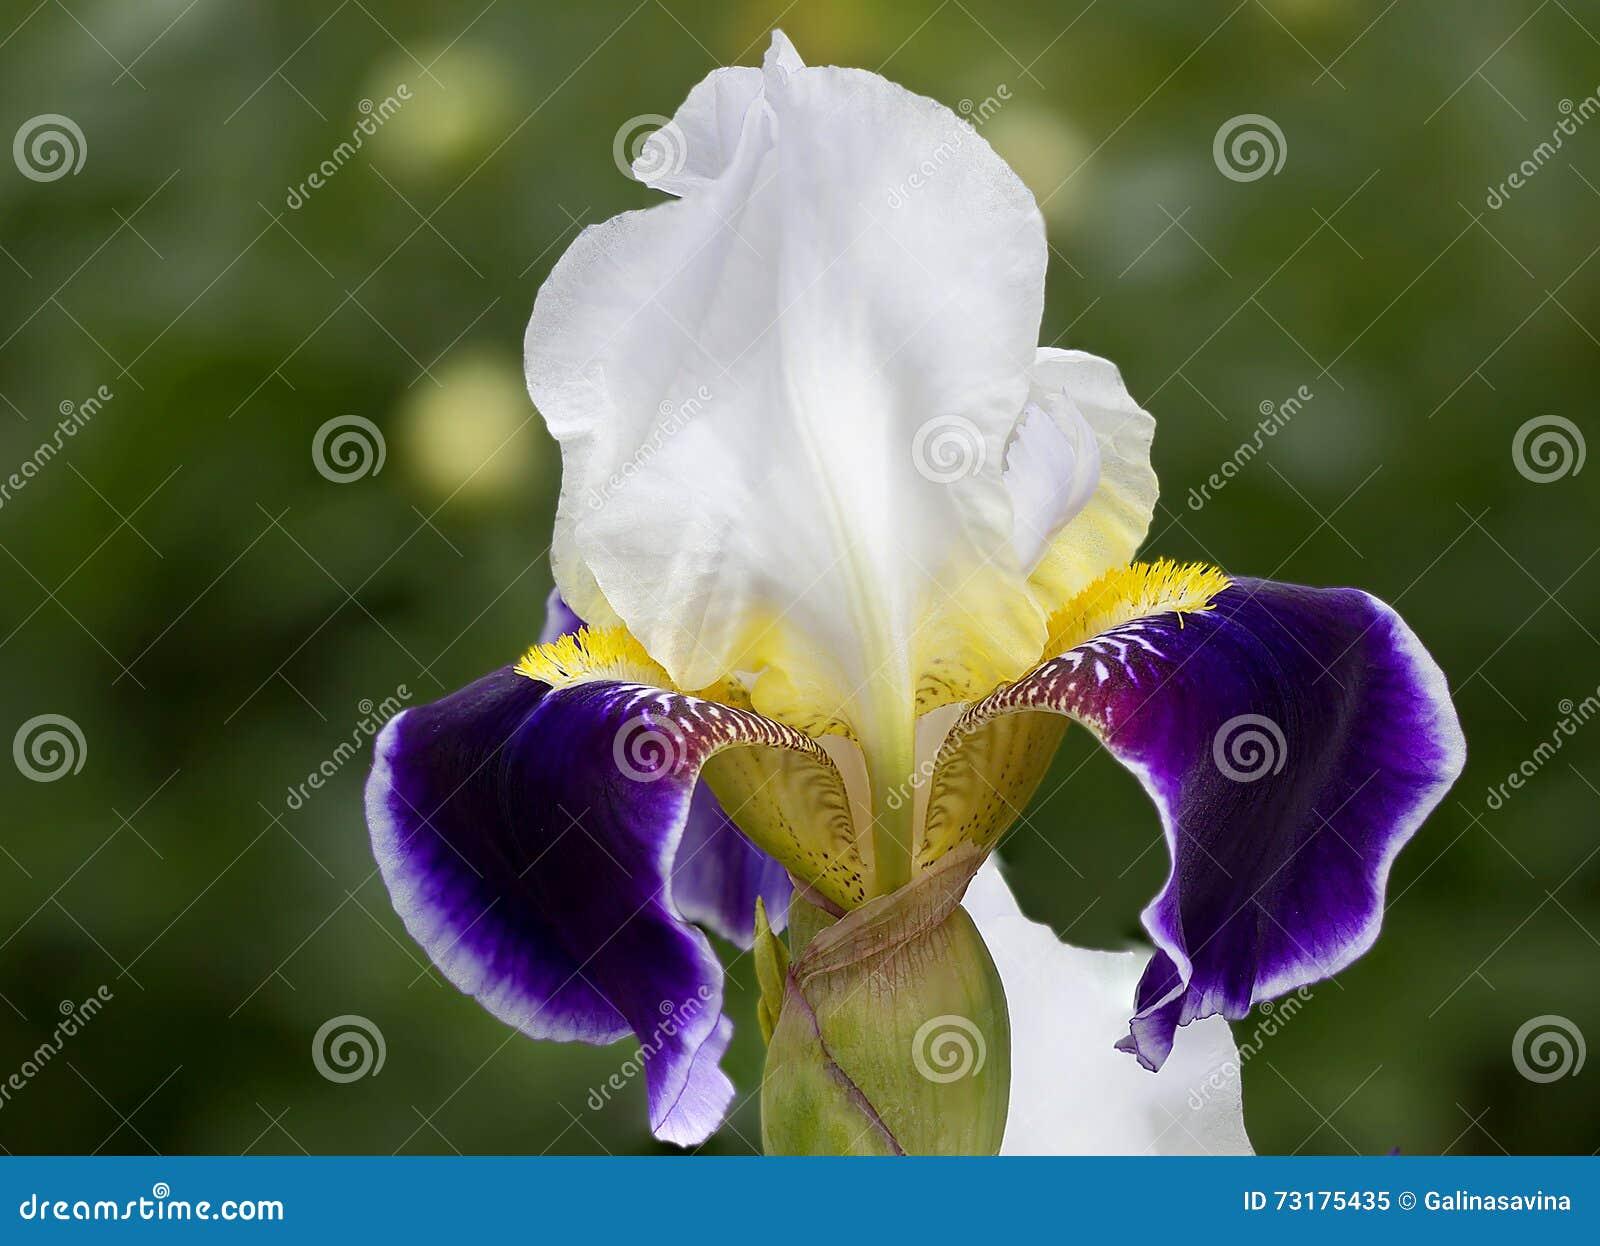 Iris the sort of beautiful night stock image image of gardening royalty free stock photo izmirmasajfo